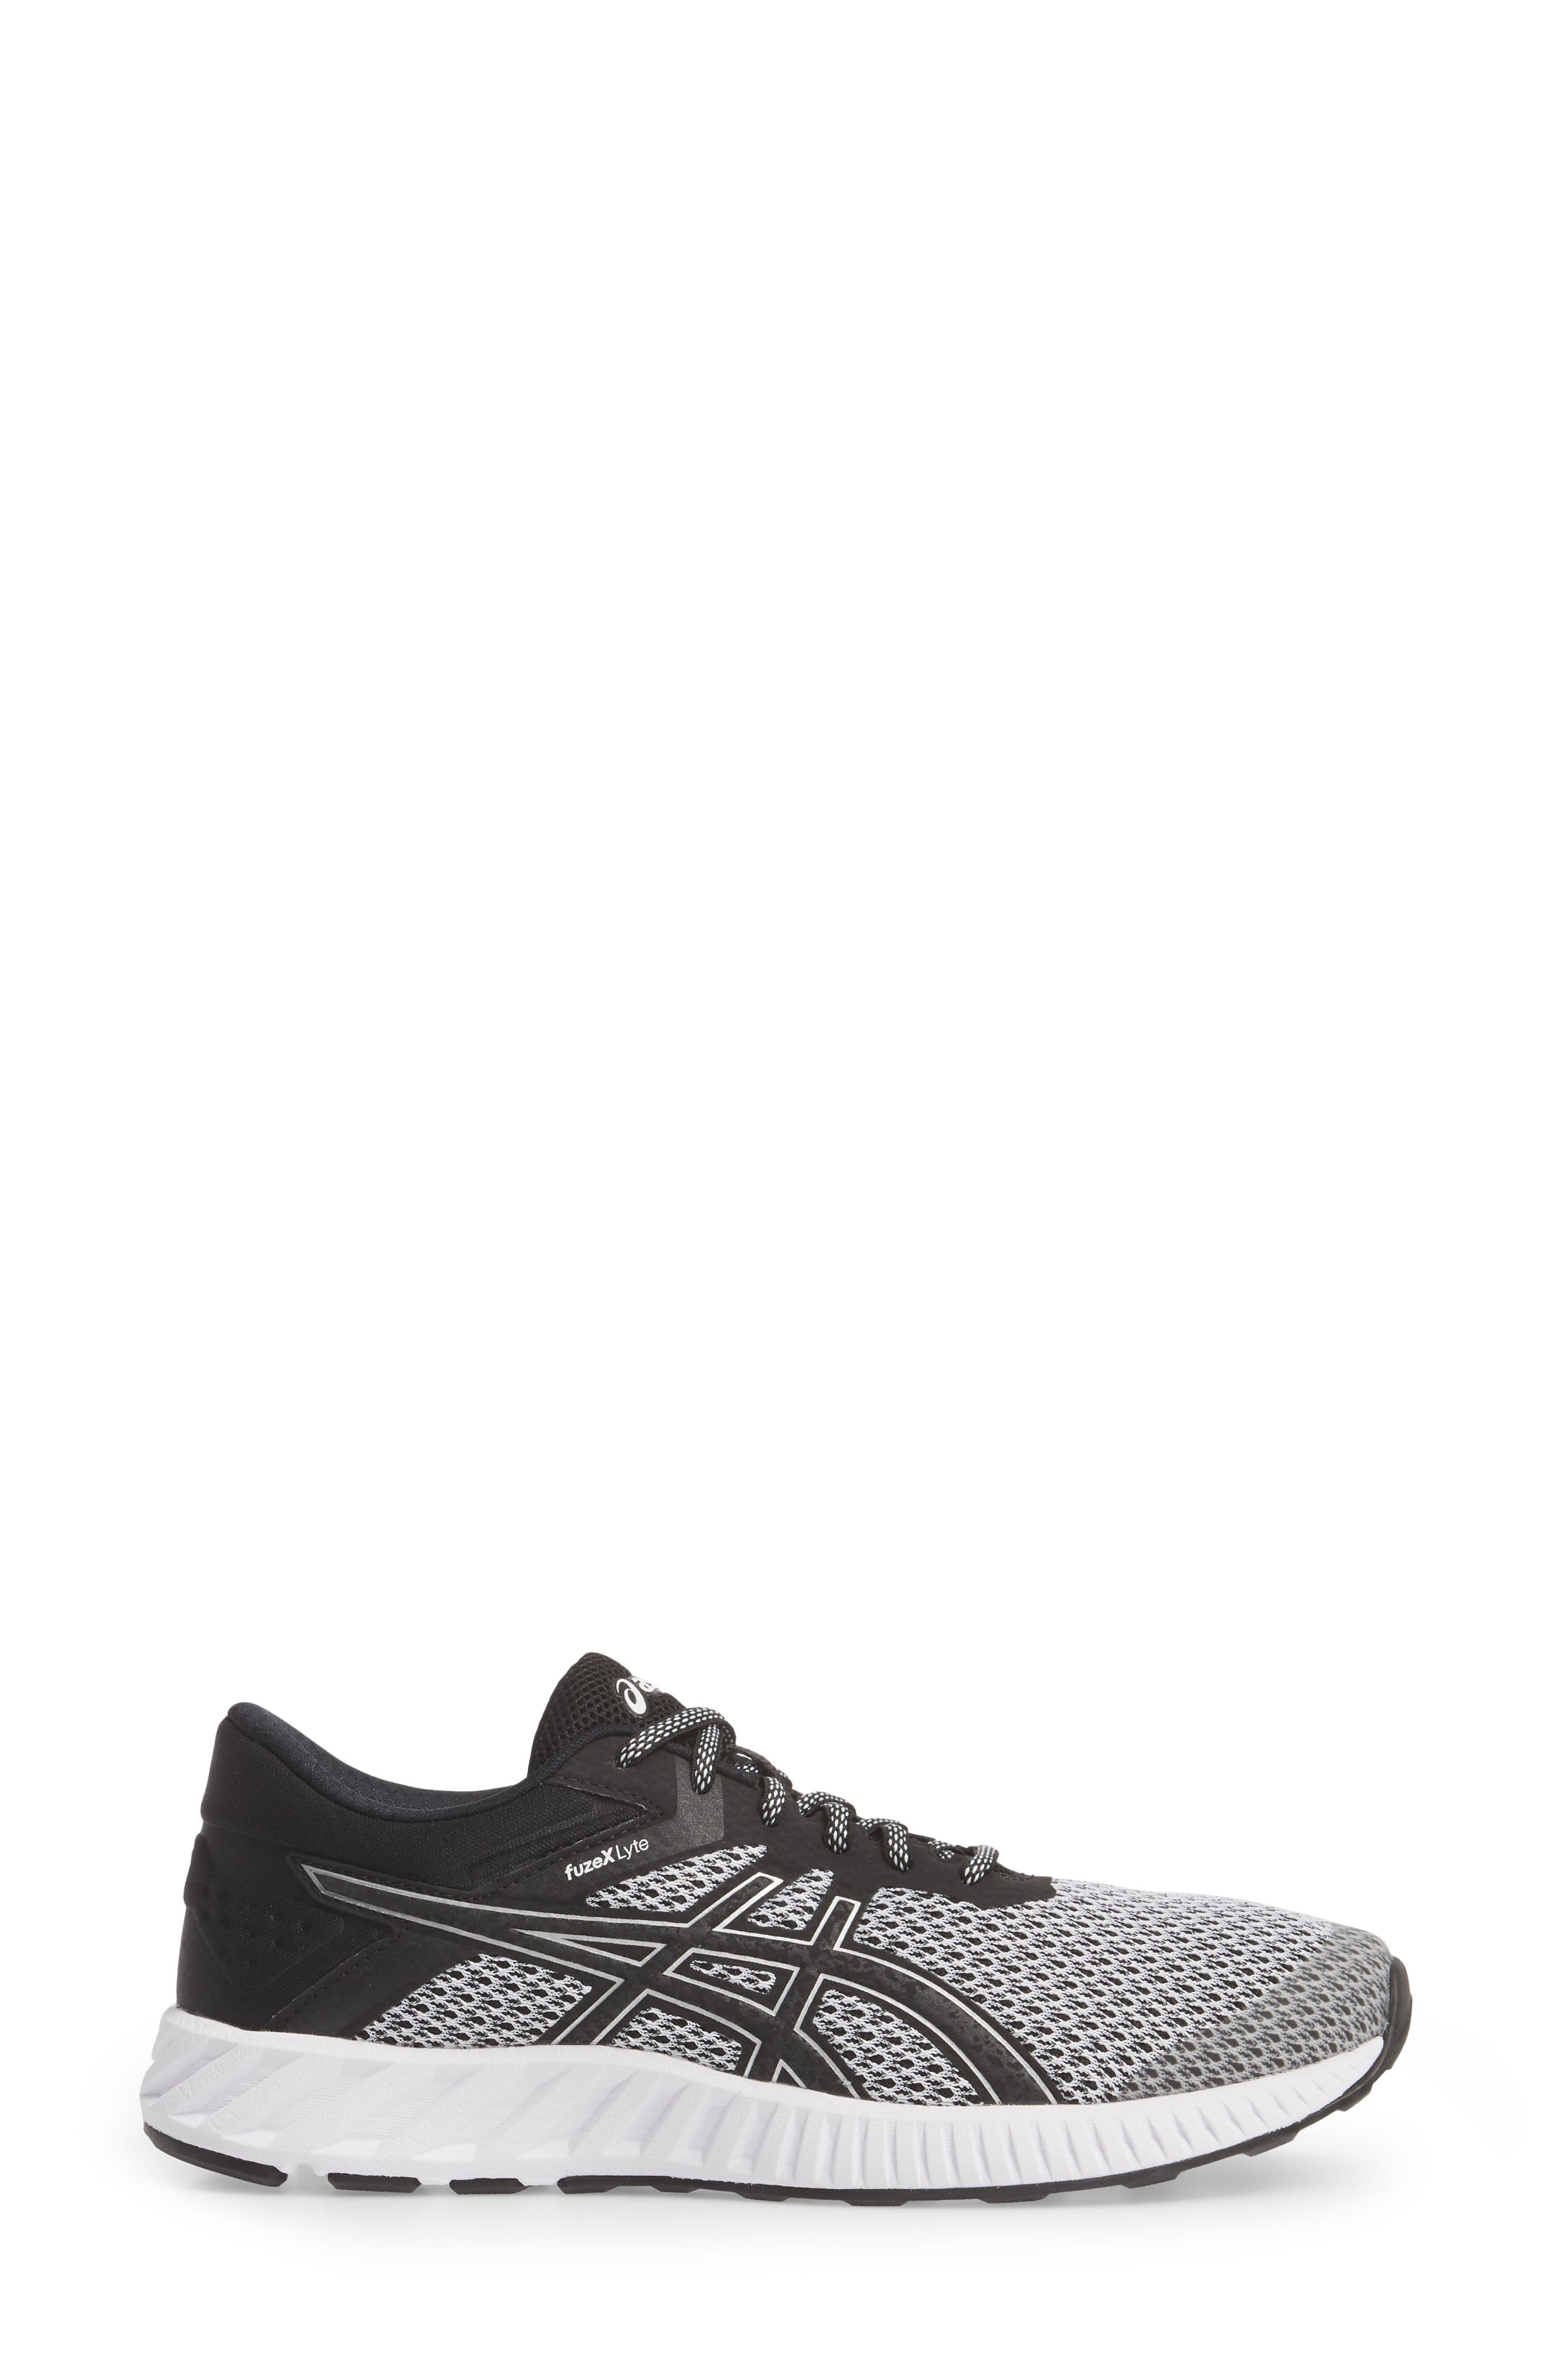 FuzeX Lyte 2 Running Shoe,                             Alternate thumbnail 3, color,                             100